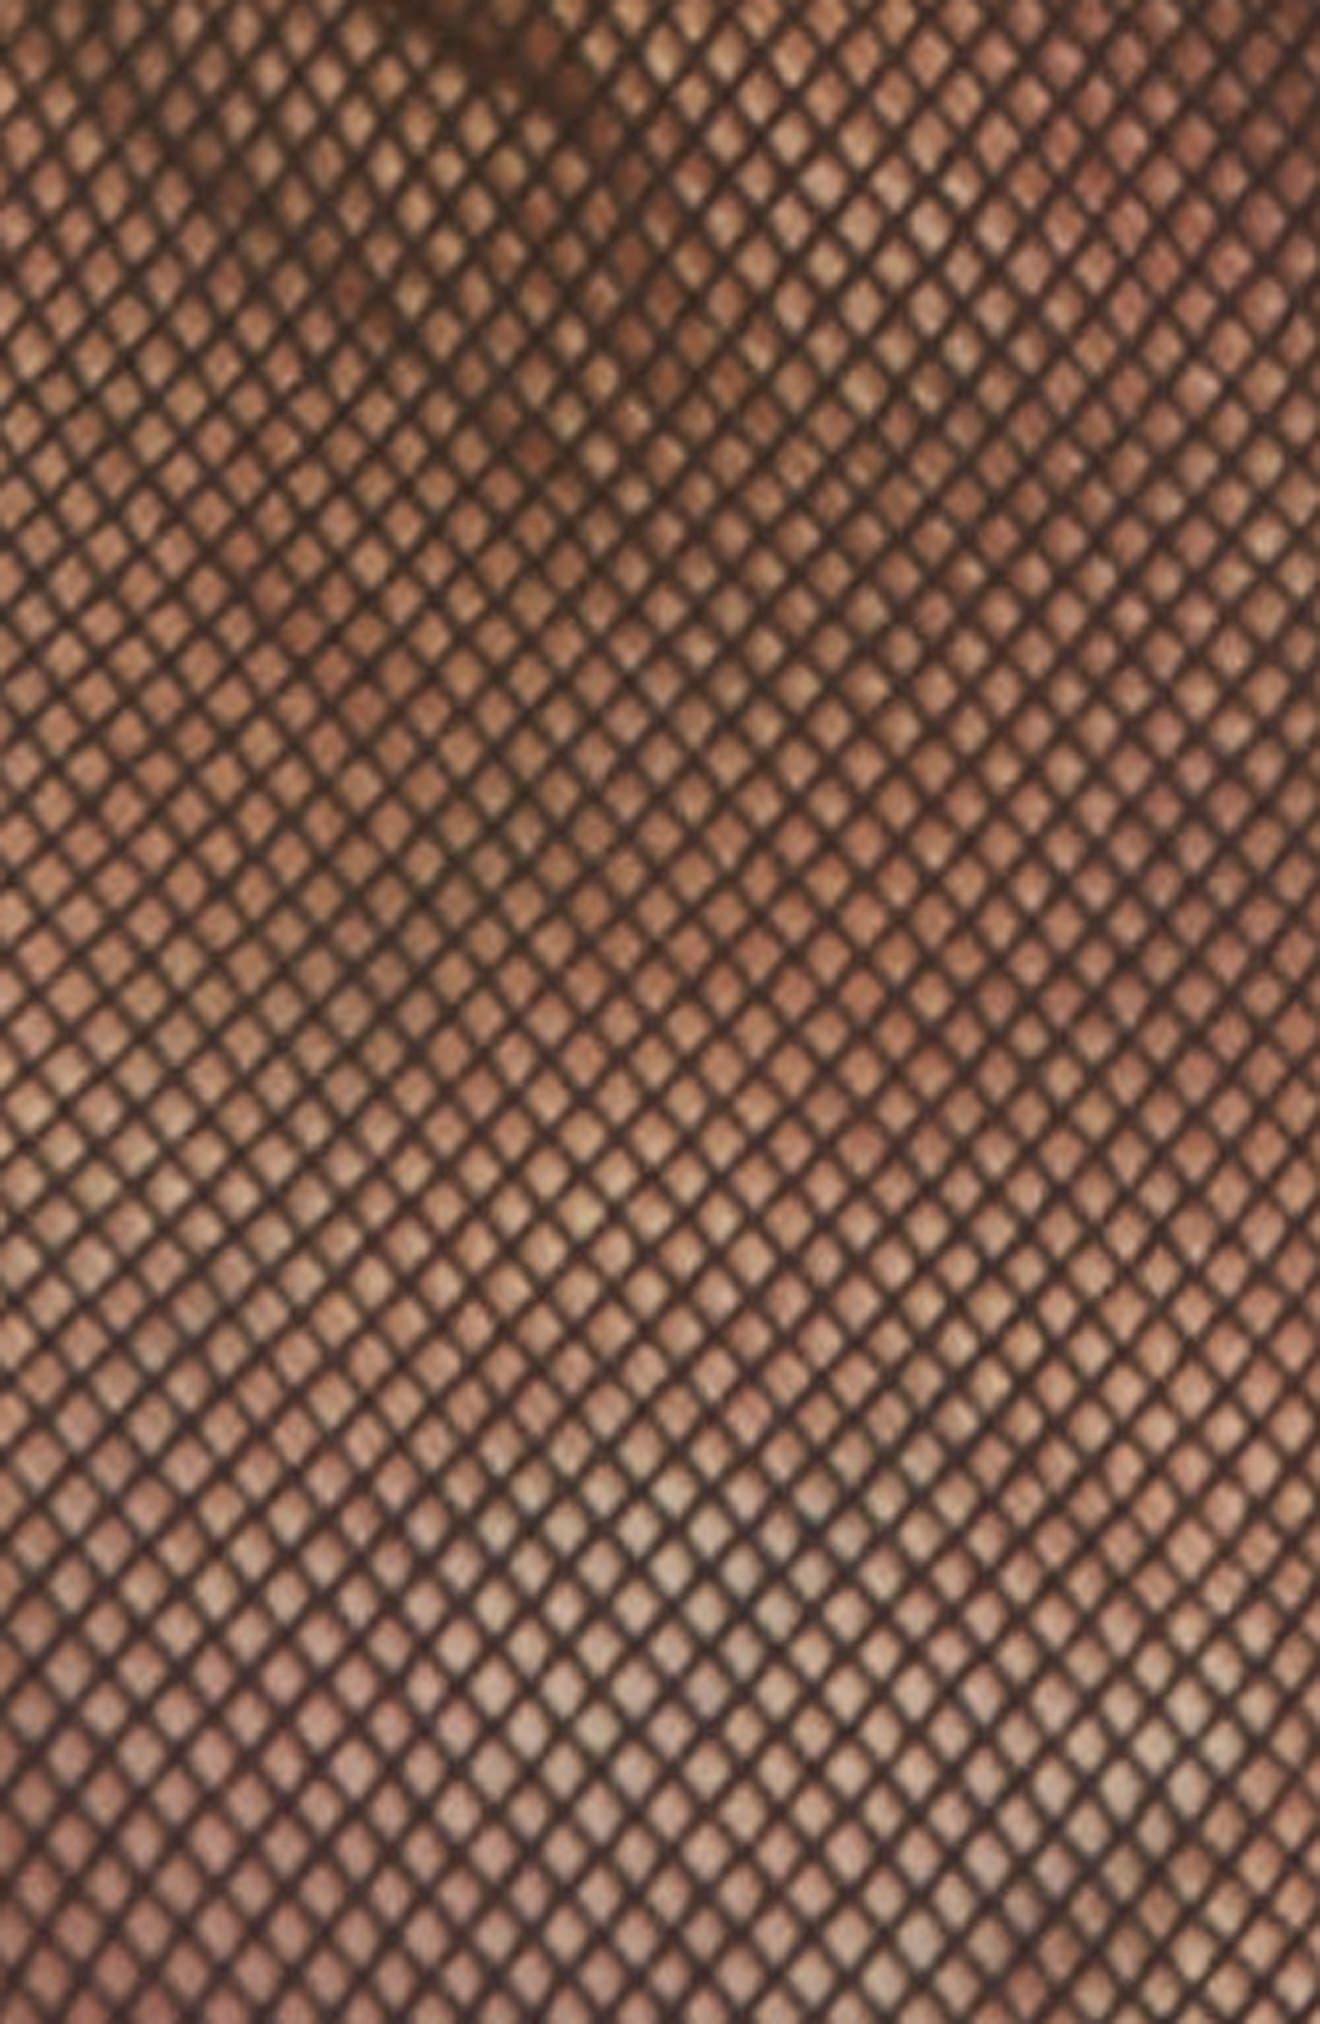 2-Pack Fishnet Anklets,                             Alternate thumbnail 2, color,                             014